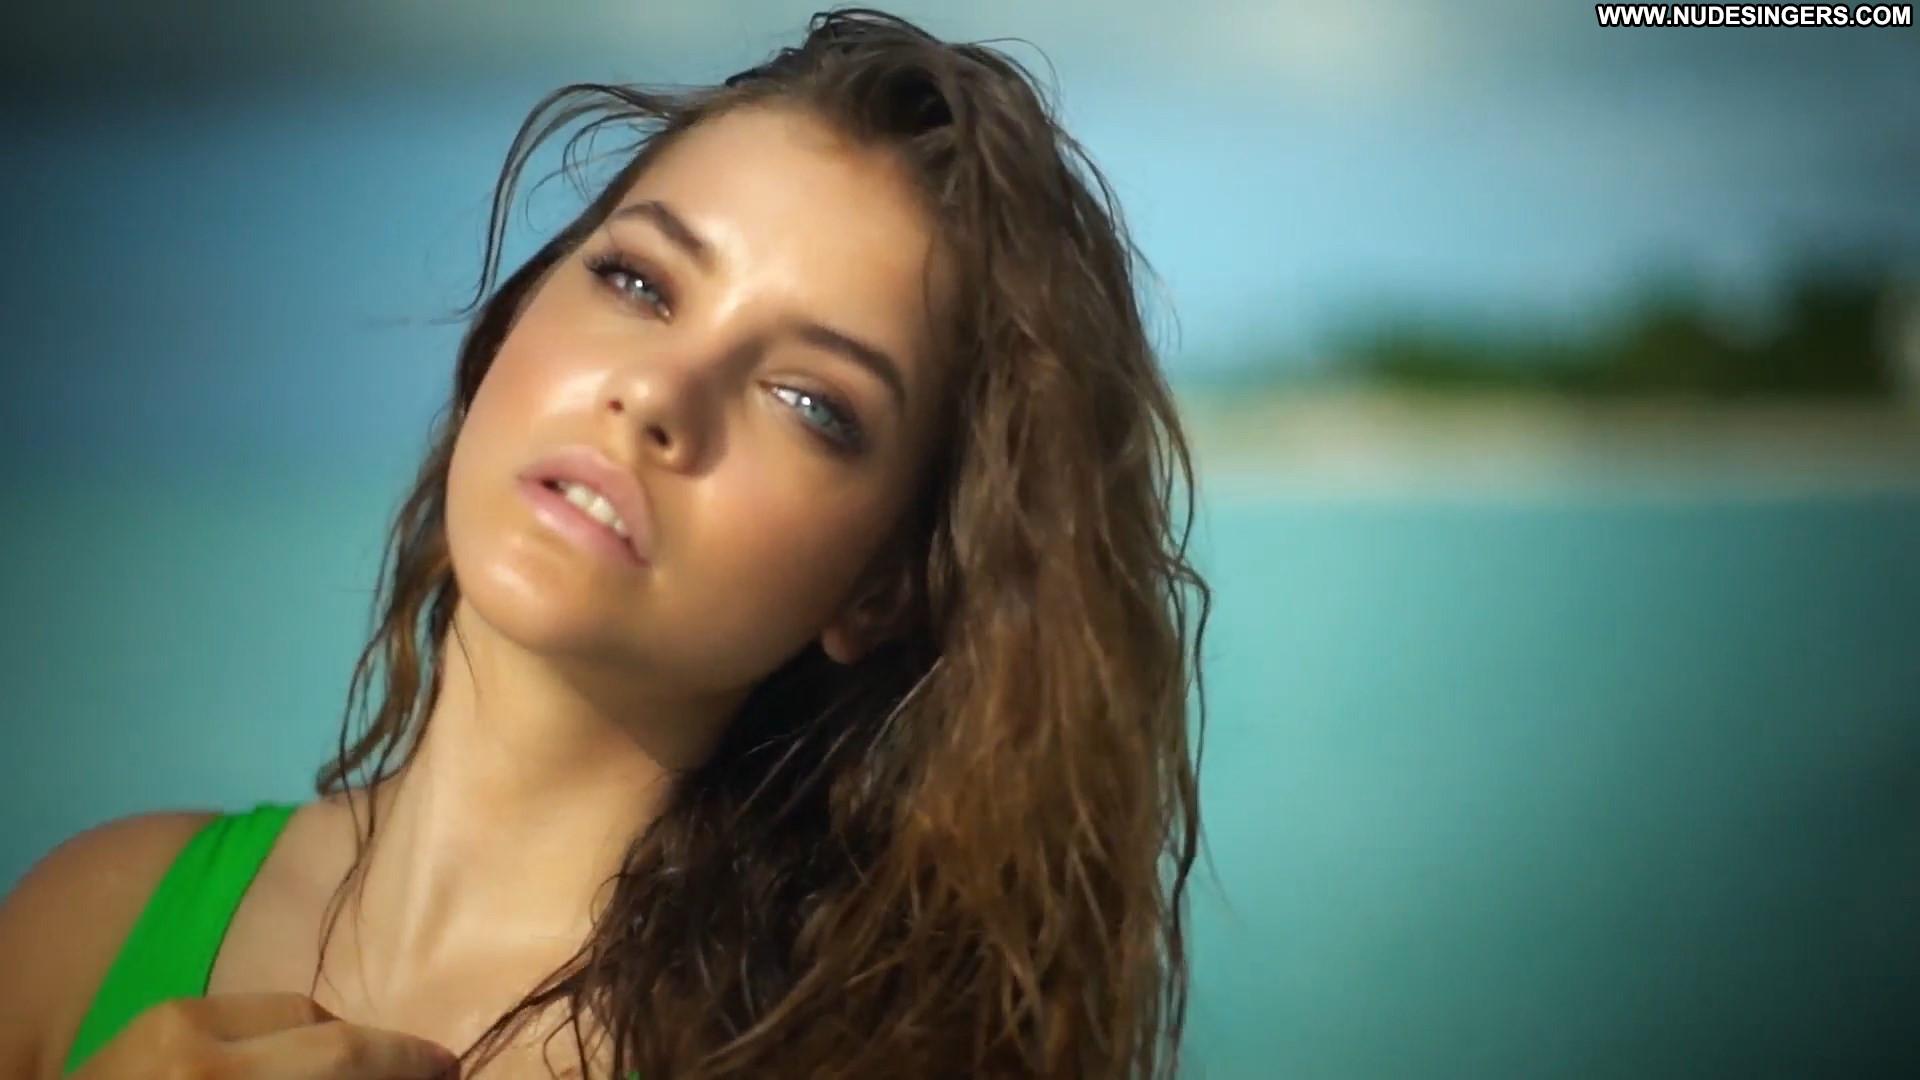 Barbara Palvin Sports Illustrated Swimsuit Celebrity Beautiful Babe Posing Hot Model Swimsuit ...